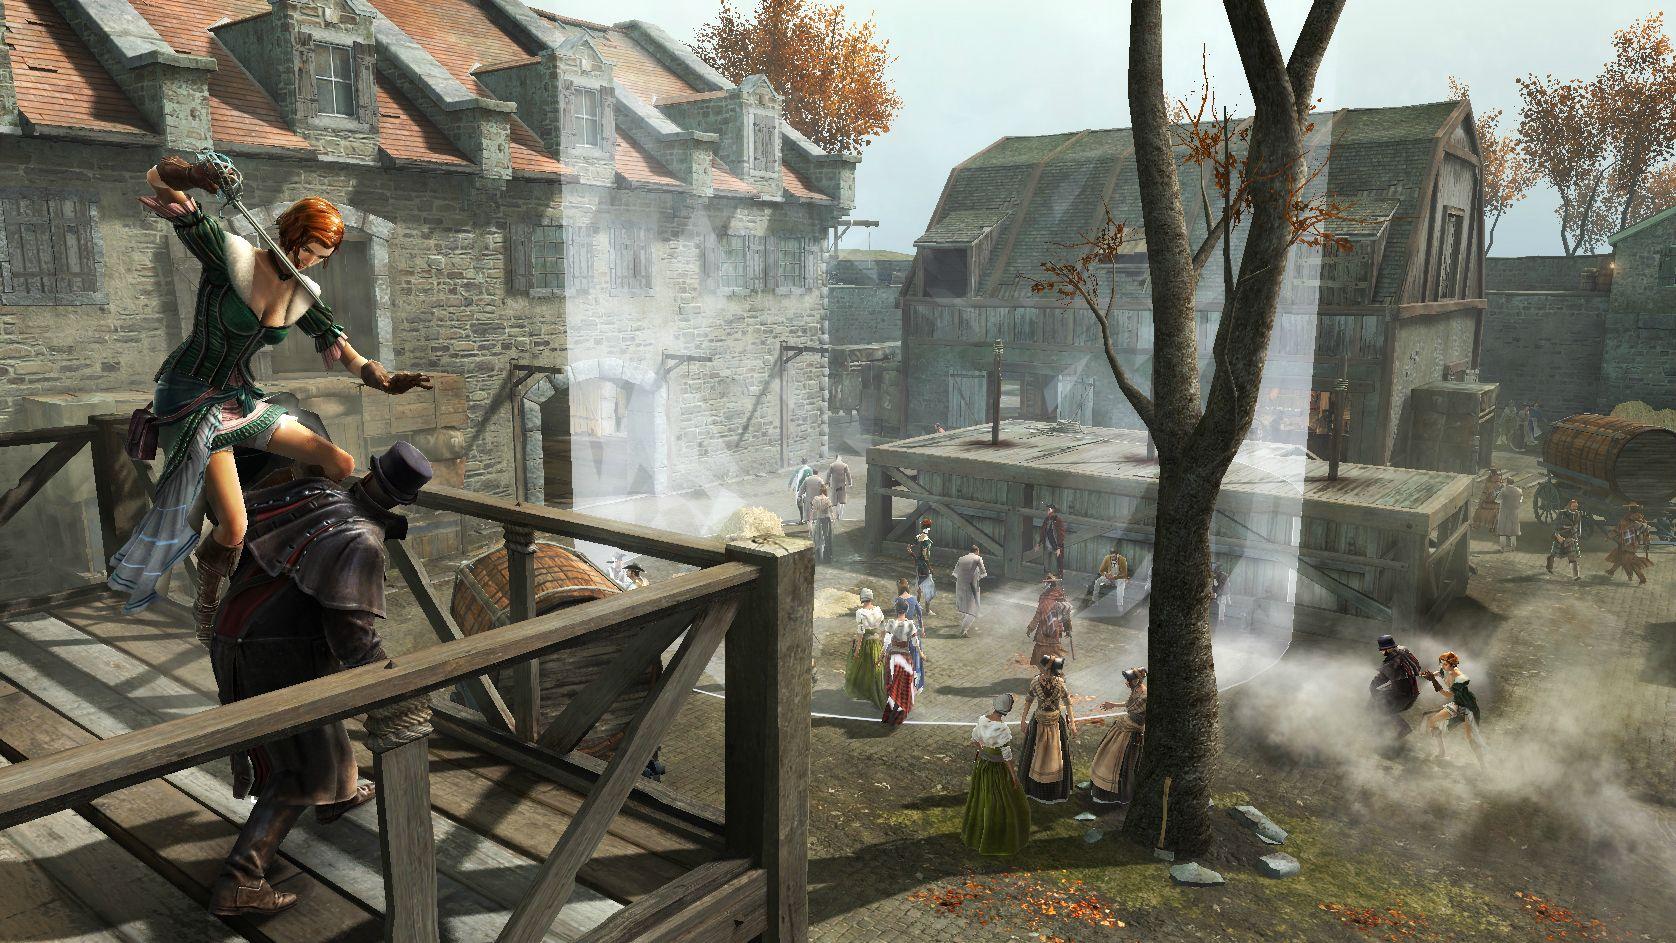 Komentovaná procházka Bostonem v Assassin's Creed 3 68057